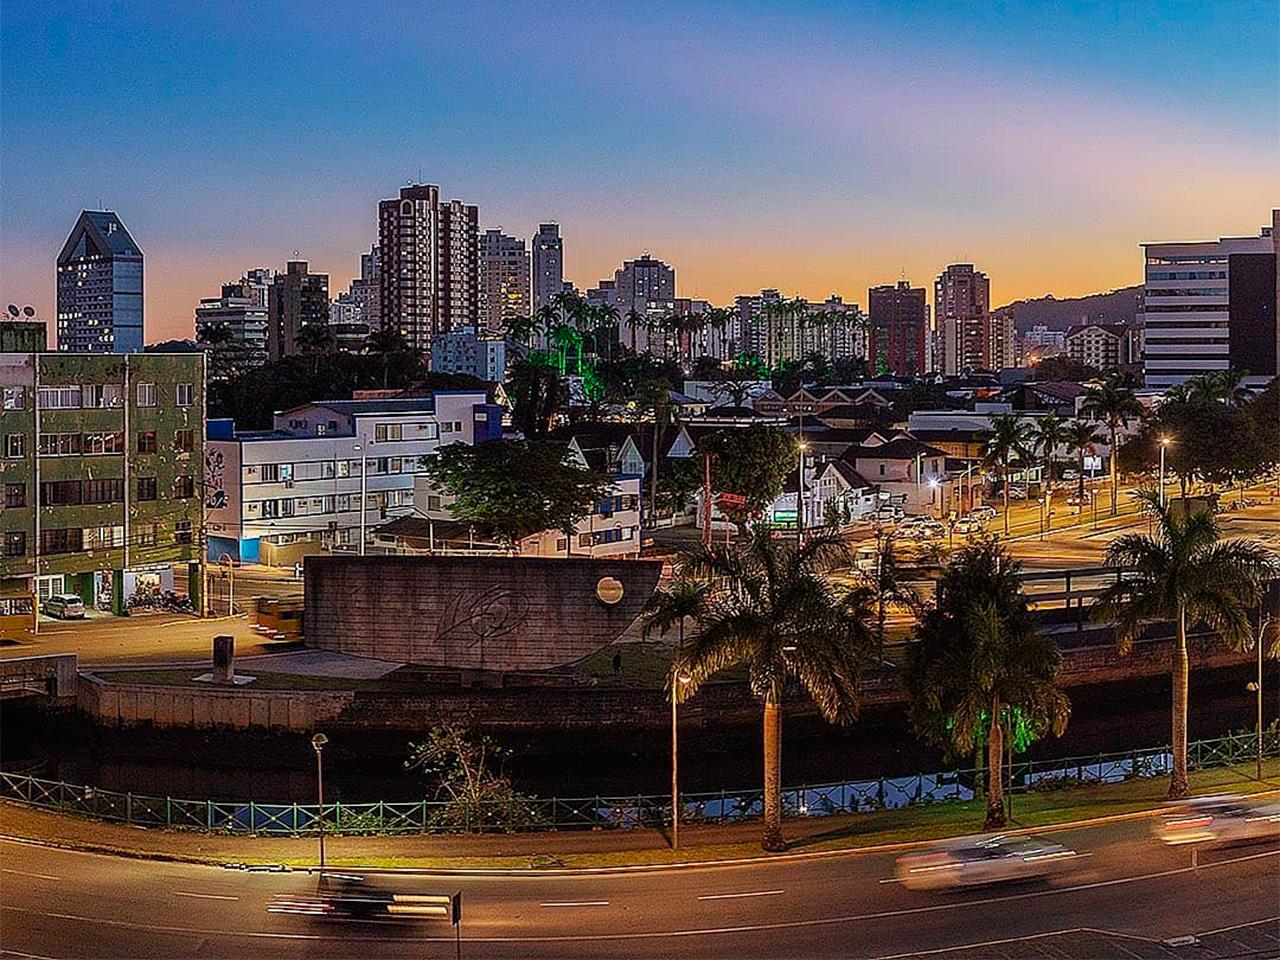 Vista da cidade de Joinville no entardecer de uma noite de outono (Photo by @alexandreviebrantz)